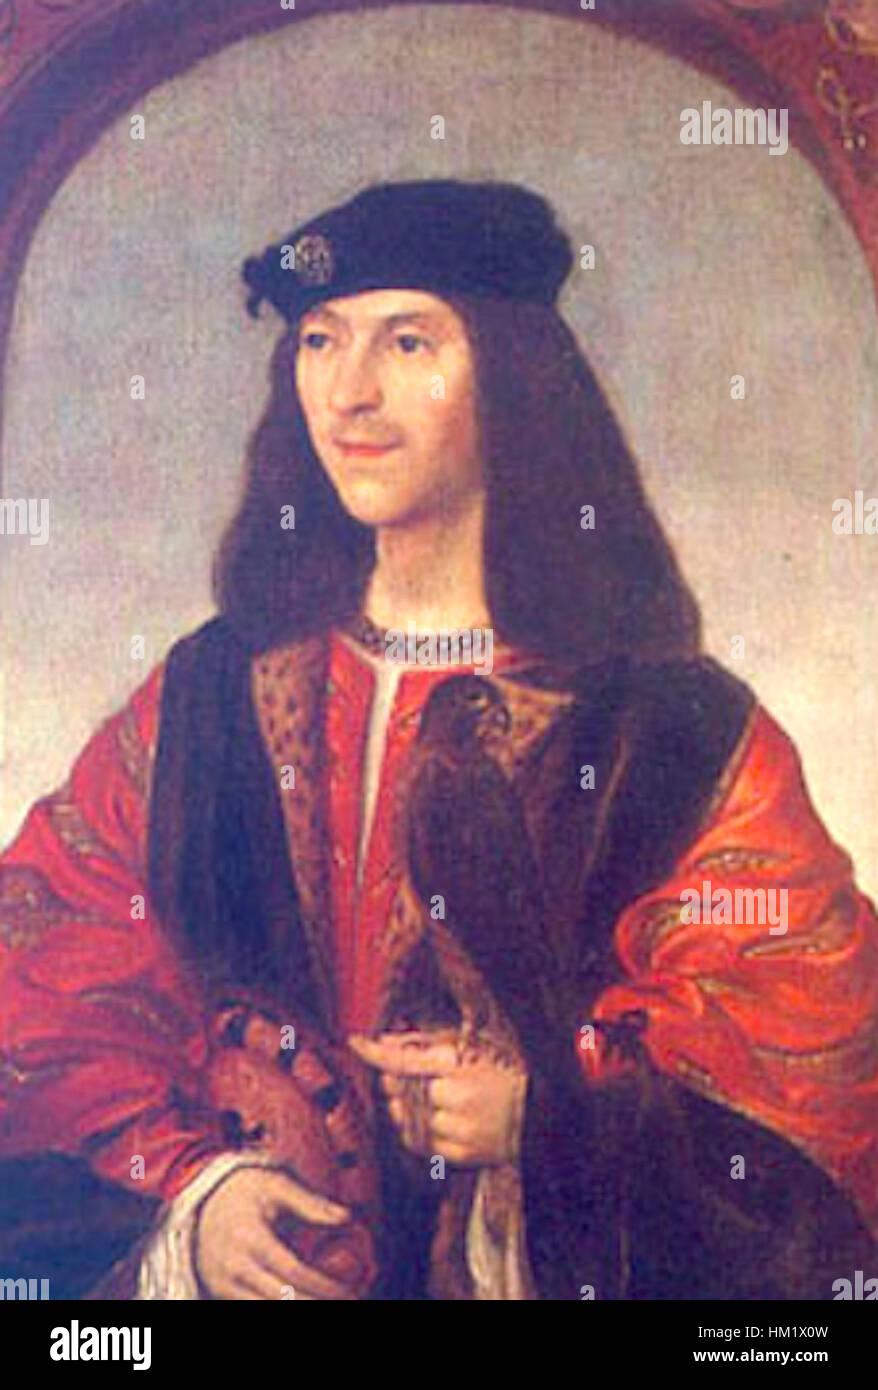 James IV King of Scotland - Stock Image